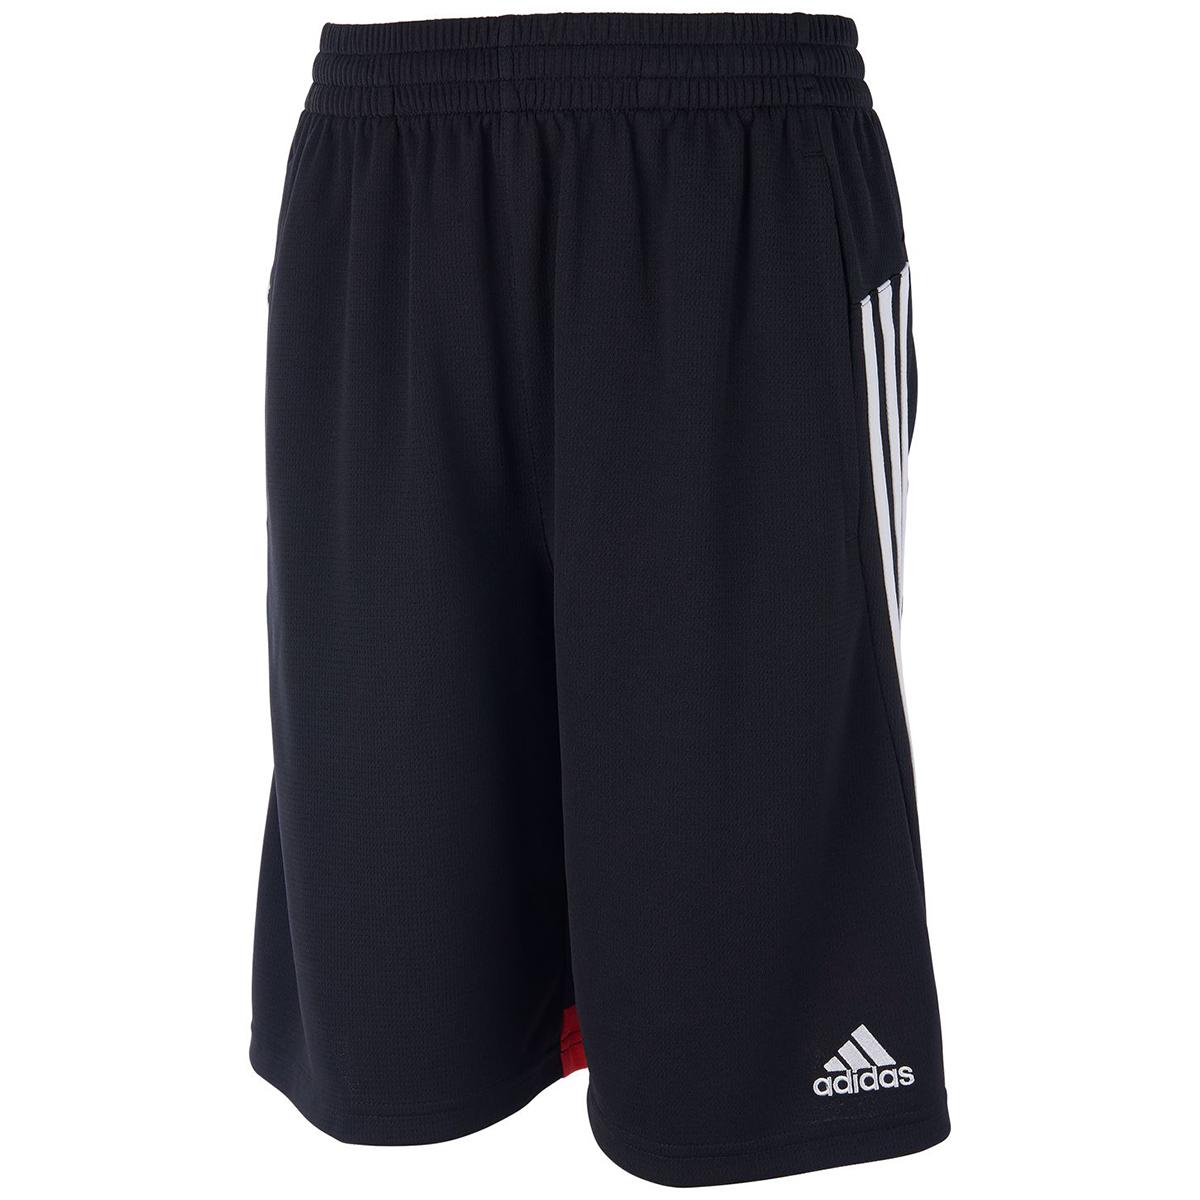 Adidas Boys' 4Krft 3 Stripe Shorts - Black, L